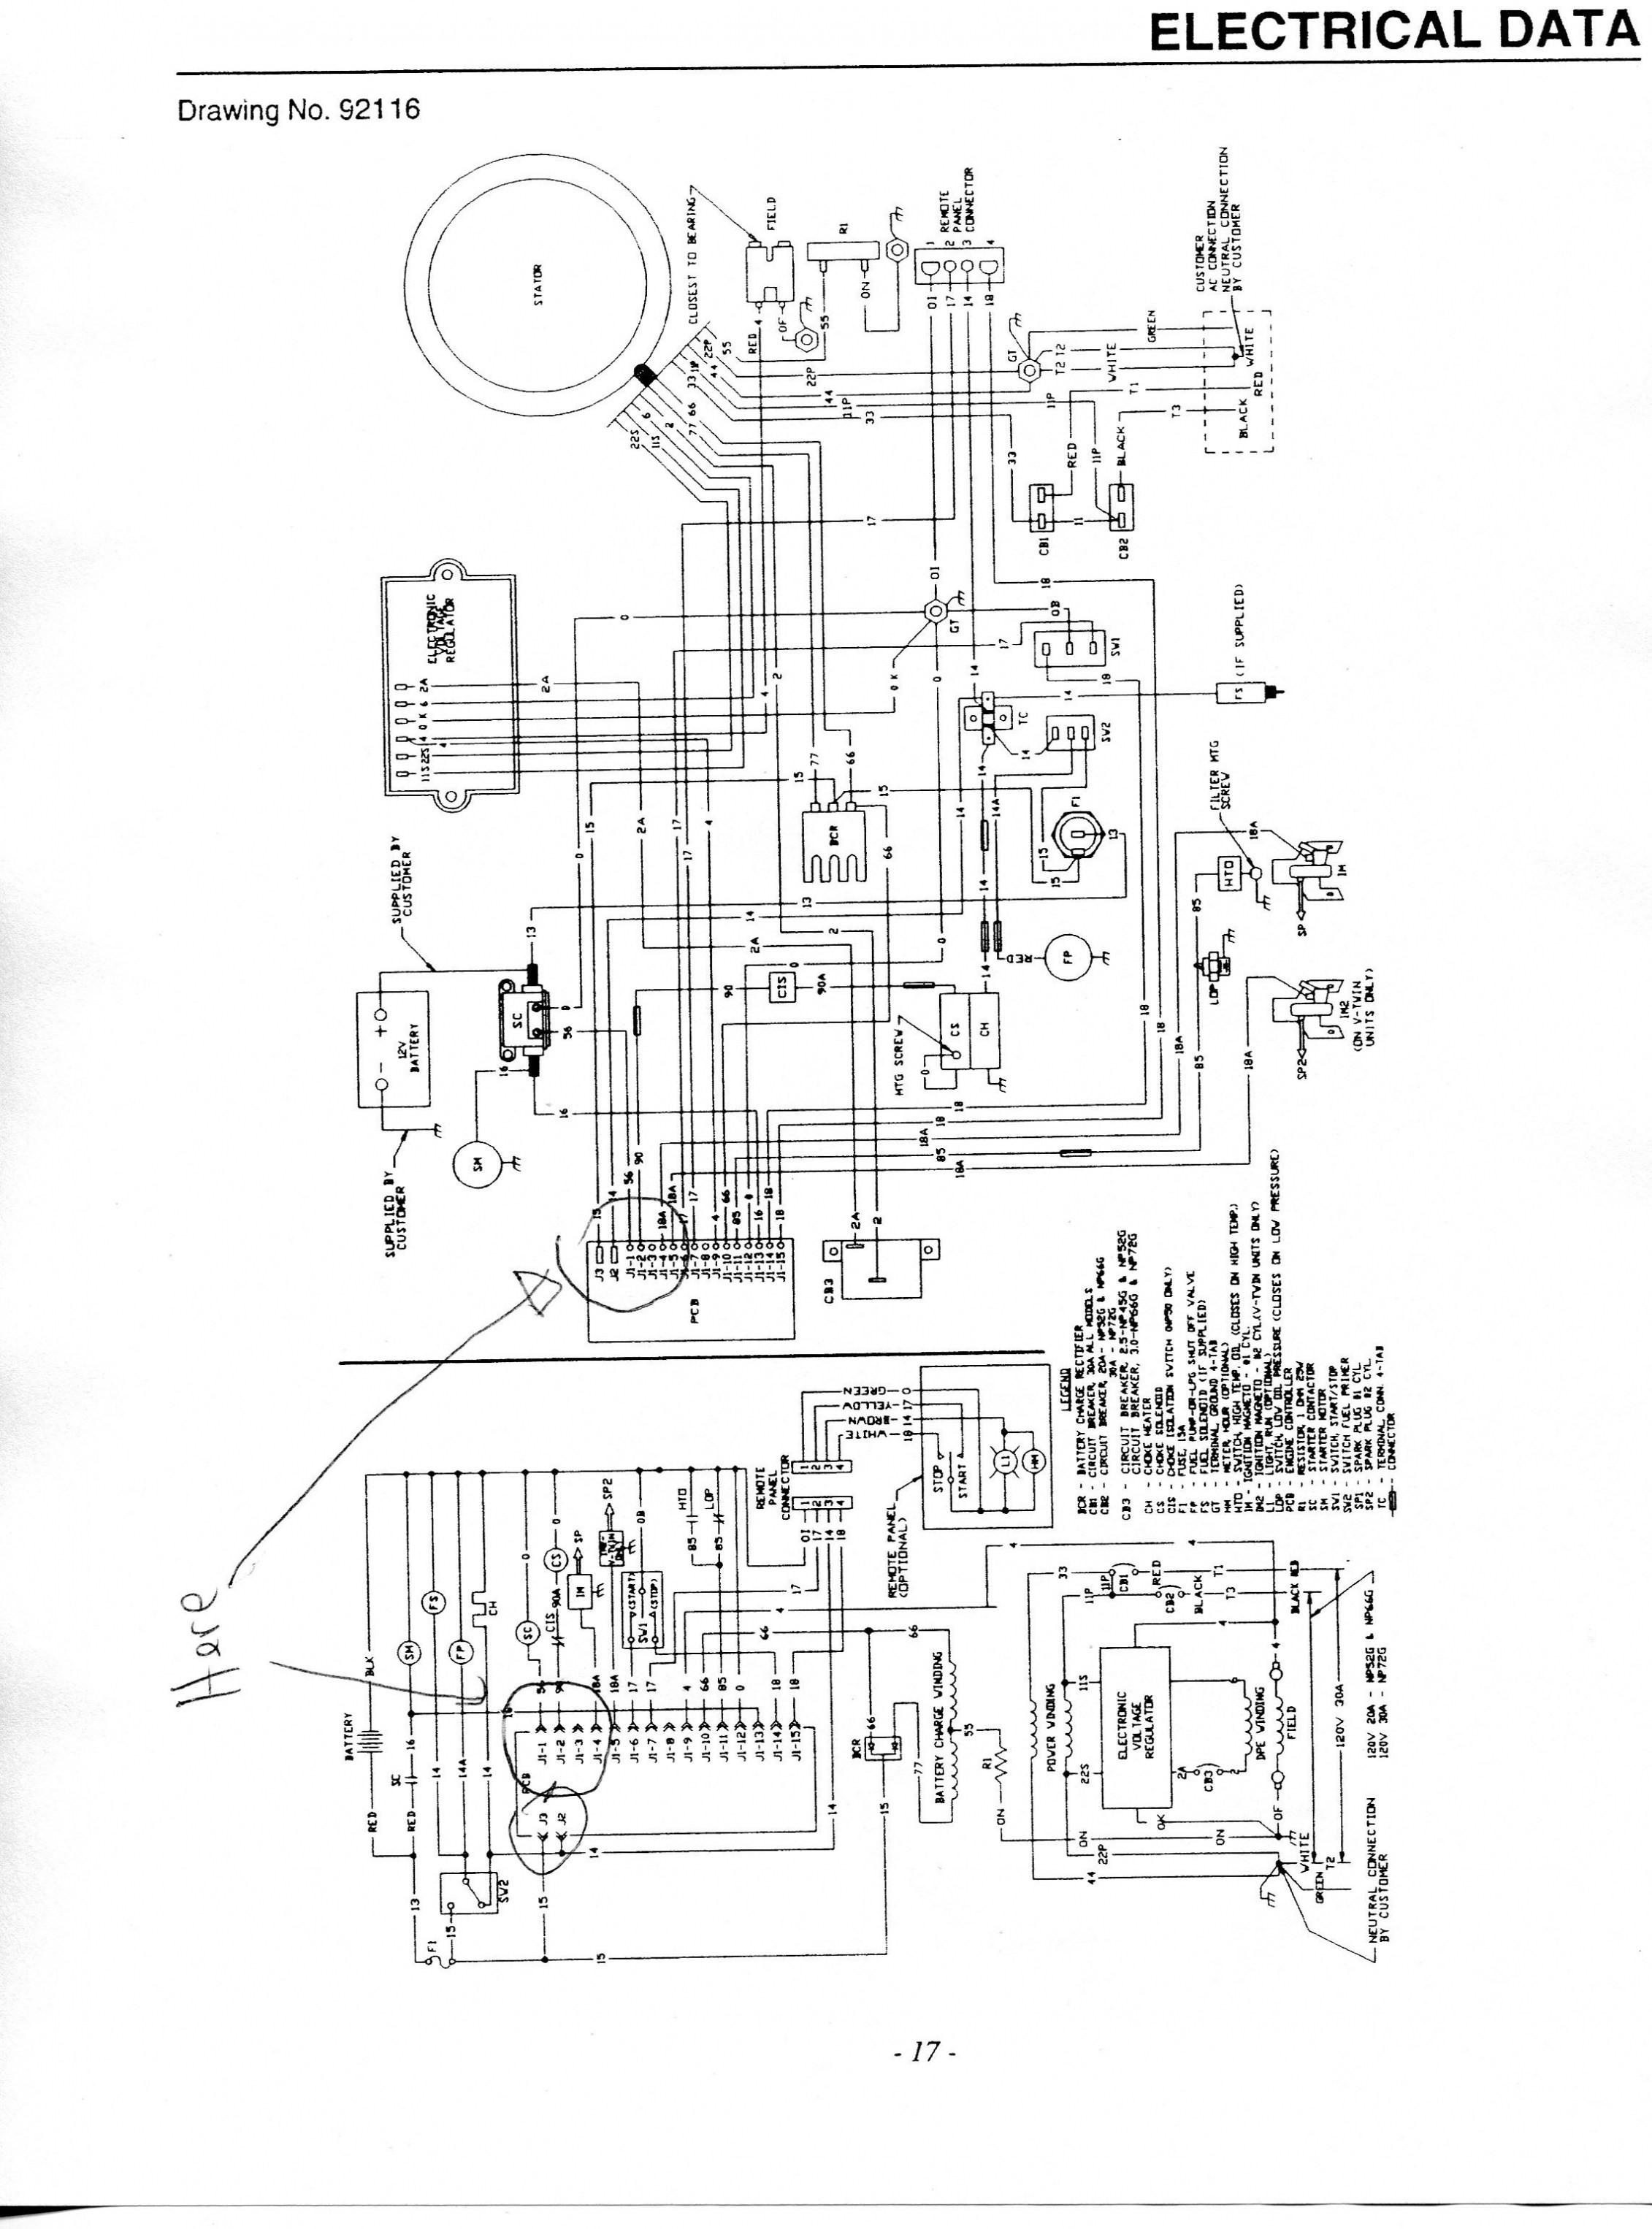 Tremendous Wiring Diagram Generac Generator New Generac Wiring Field Library Wiring Cloud Loplapiotaidewilluminateatxorg